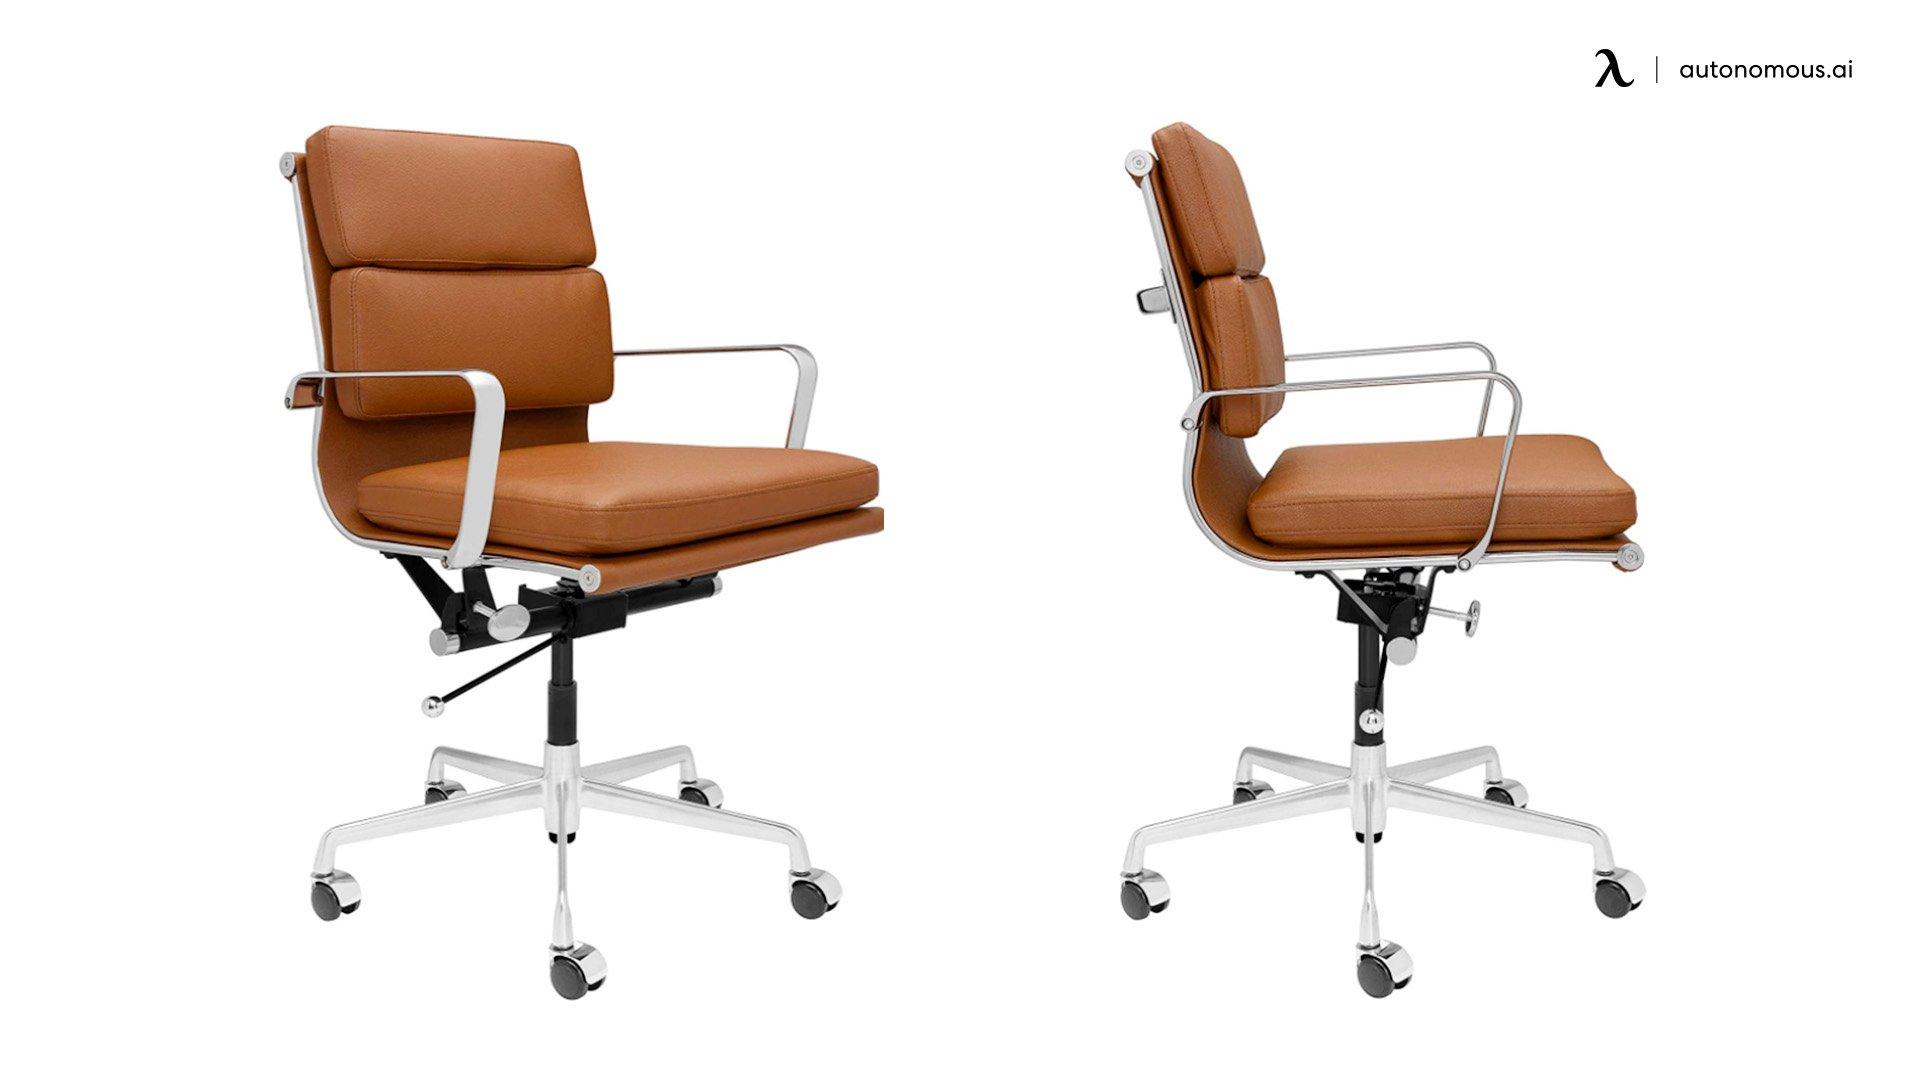 The Laura Davidson Direct SOHO Soft Pad Management Chair